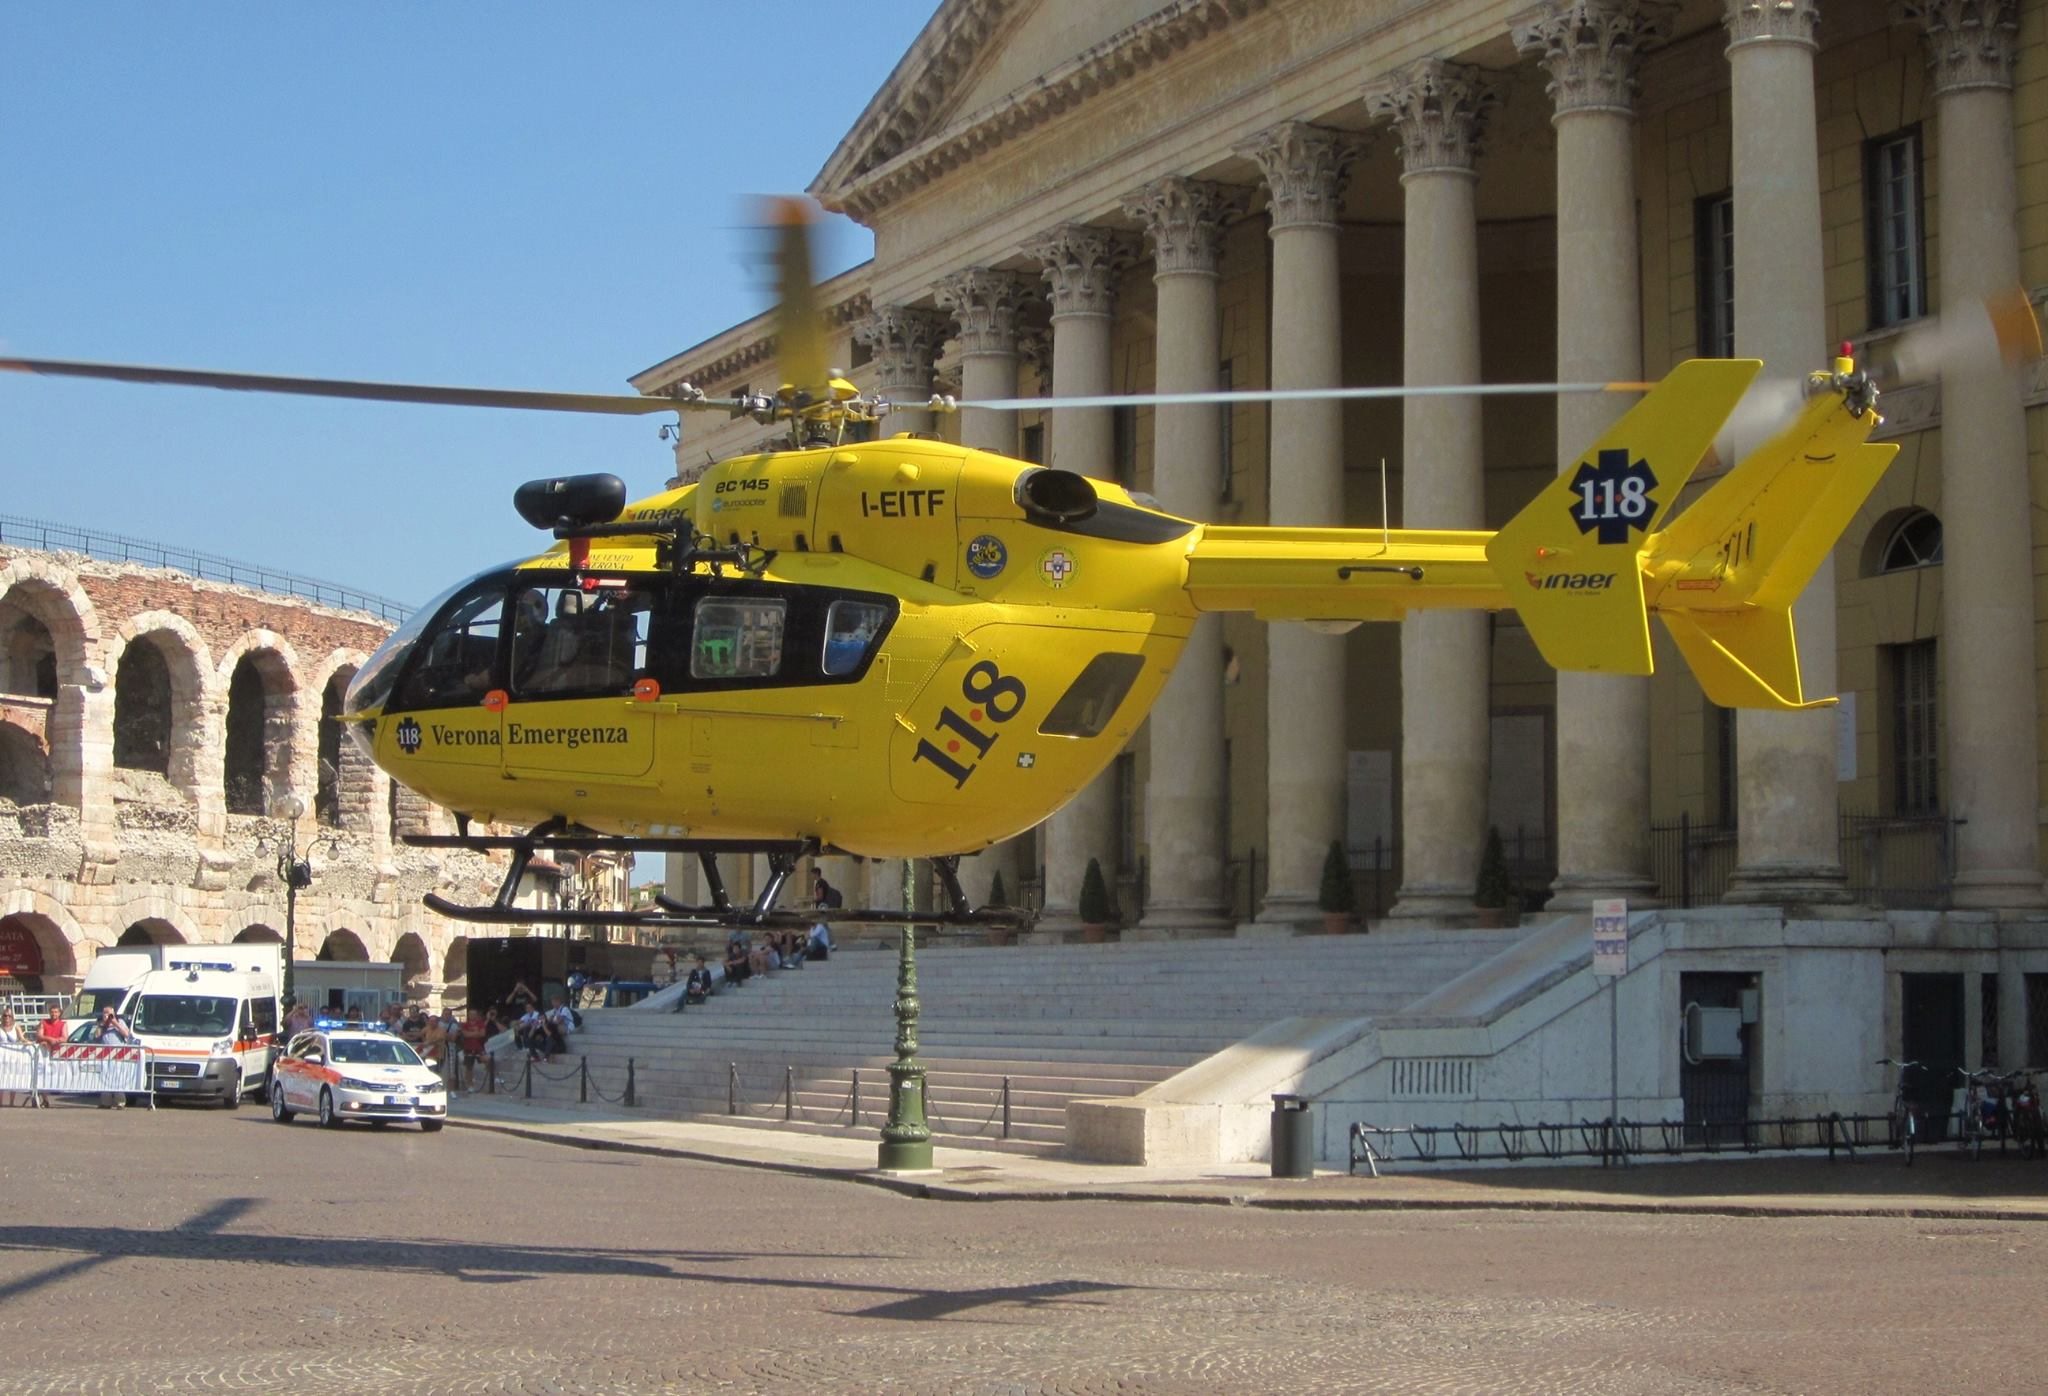 Elicottero 118 Verona : Elicottero verona emergenza croce bianca verona